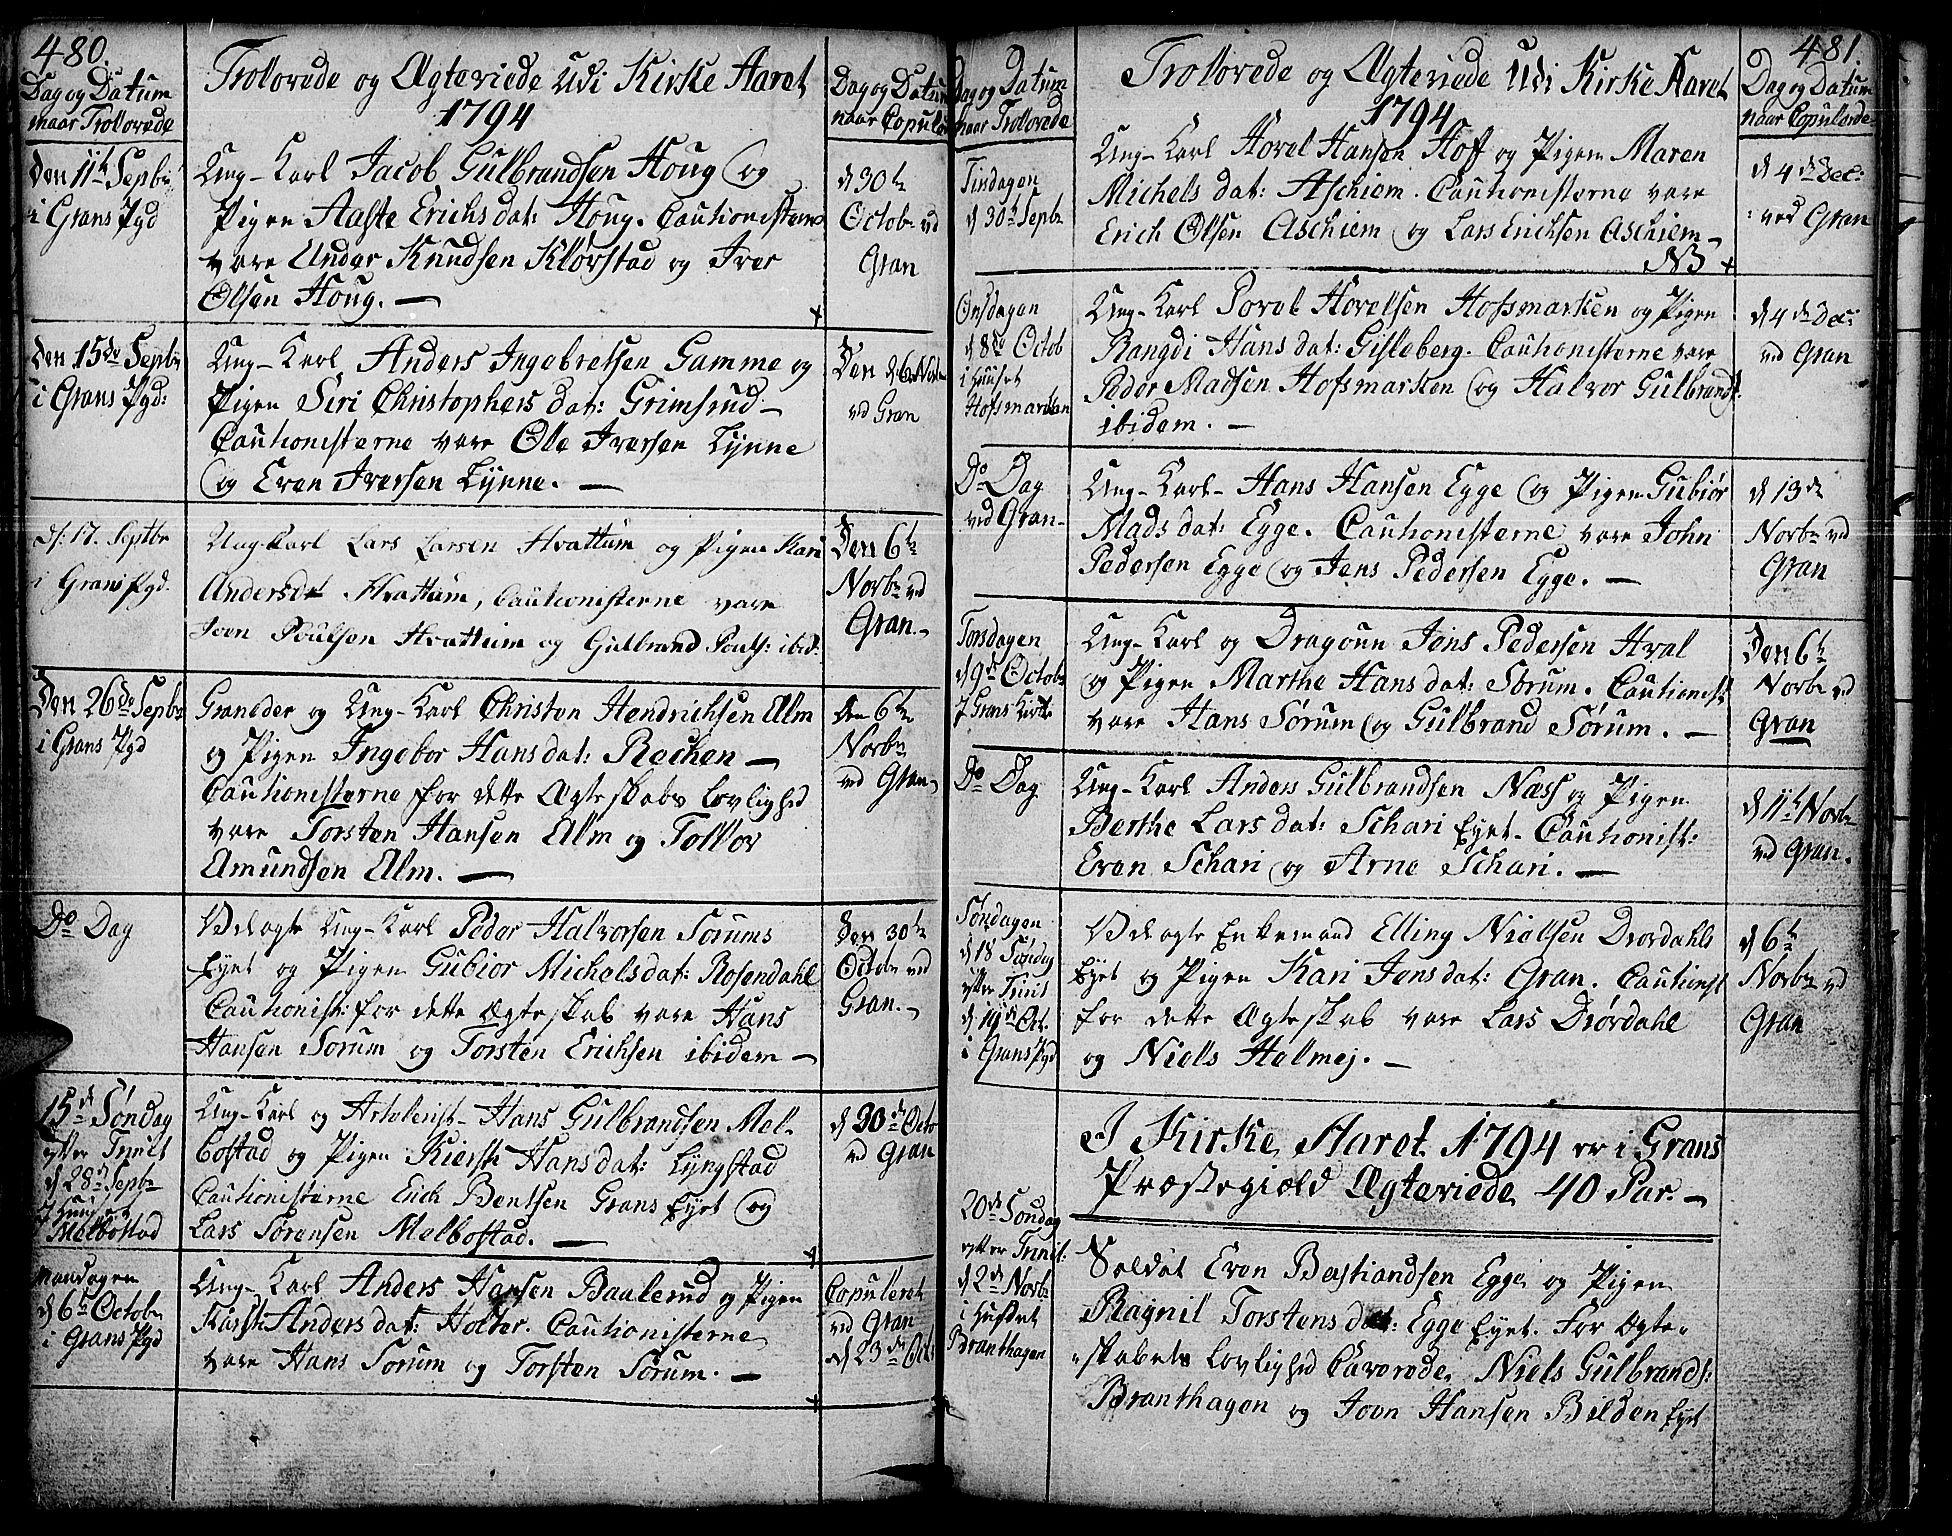 SAH, Gran prestekontor, Ministerialbok nr. 6, 1787-1824, s. 480-481